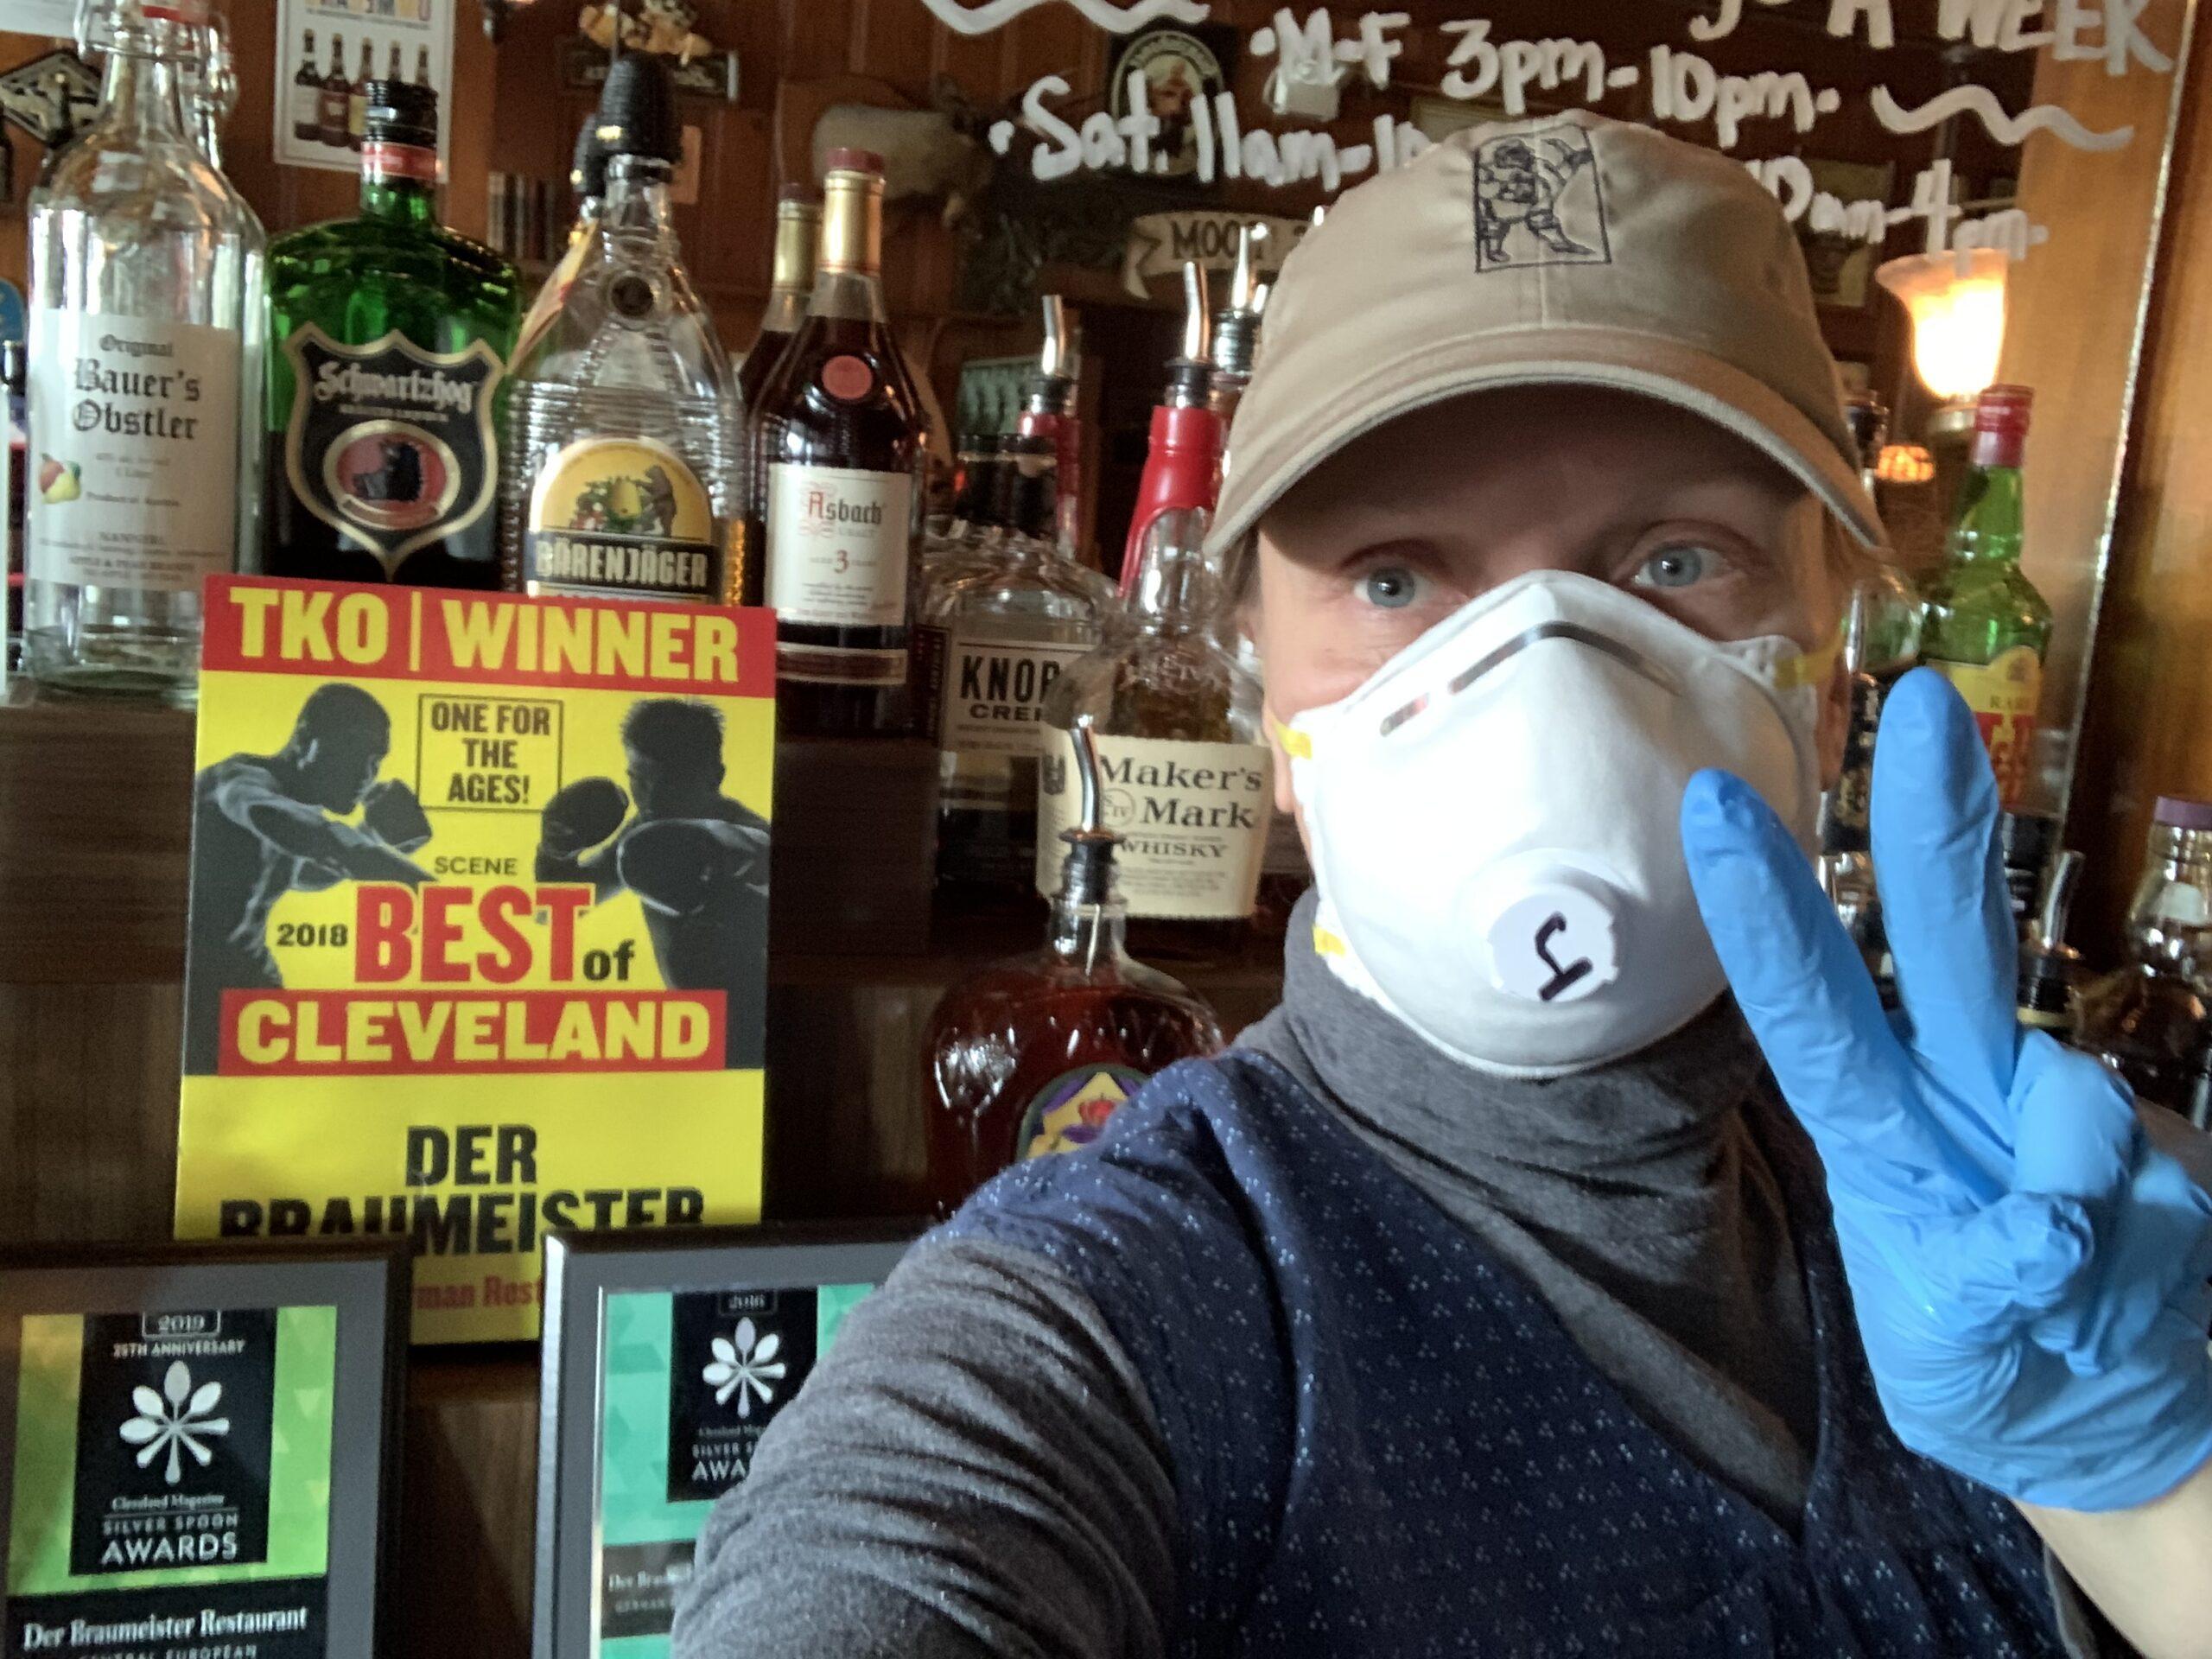 Inside Der Braumeister in Cleveland